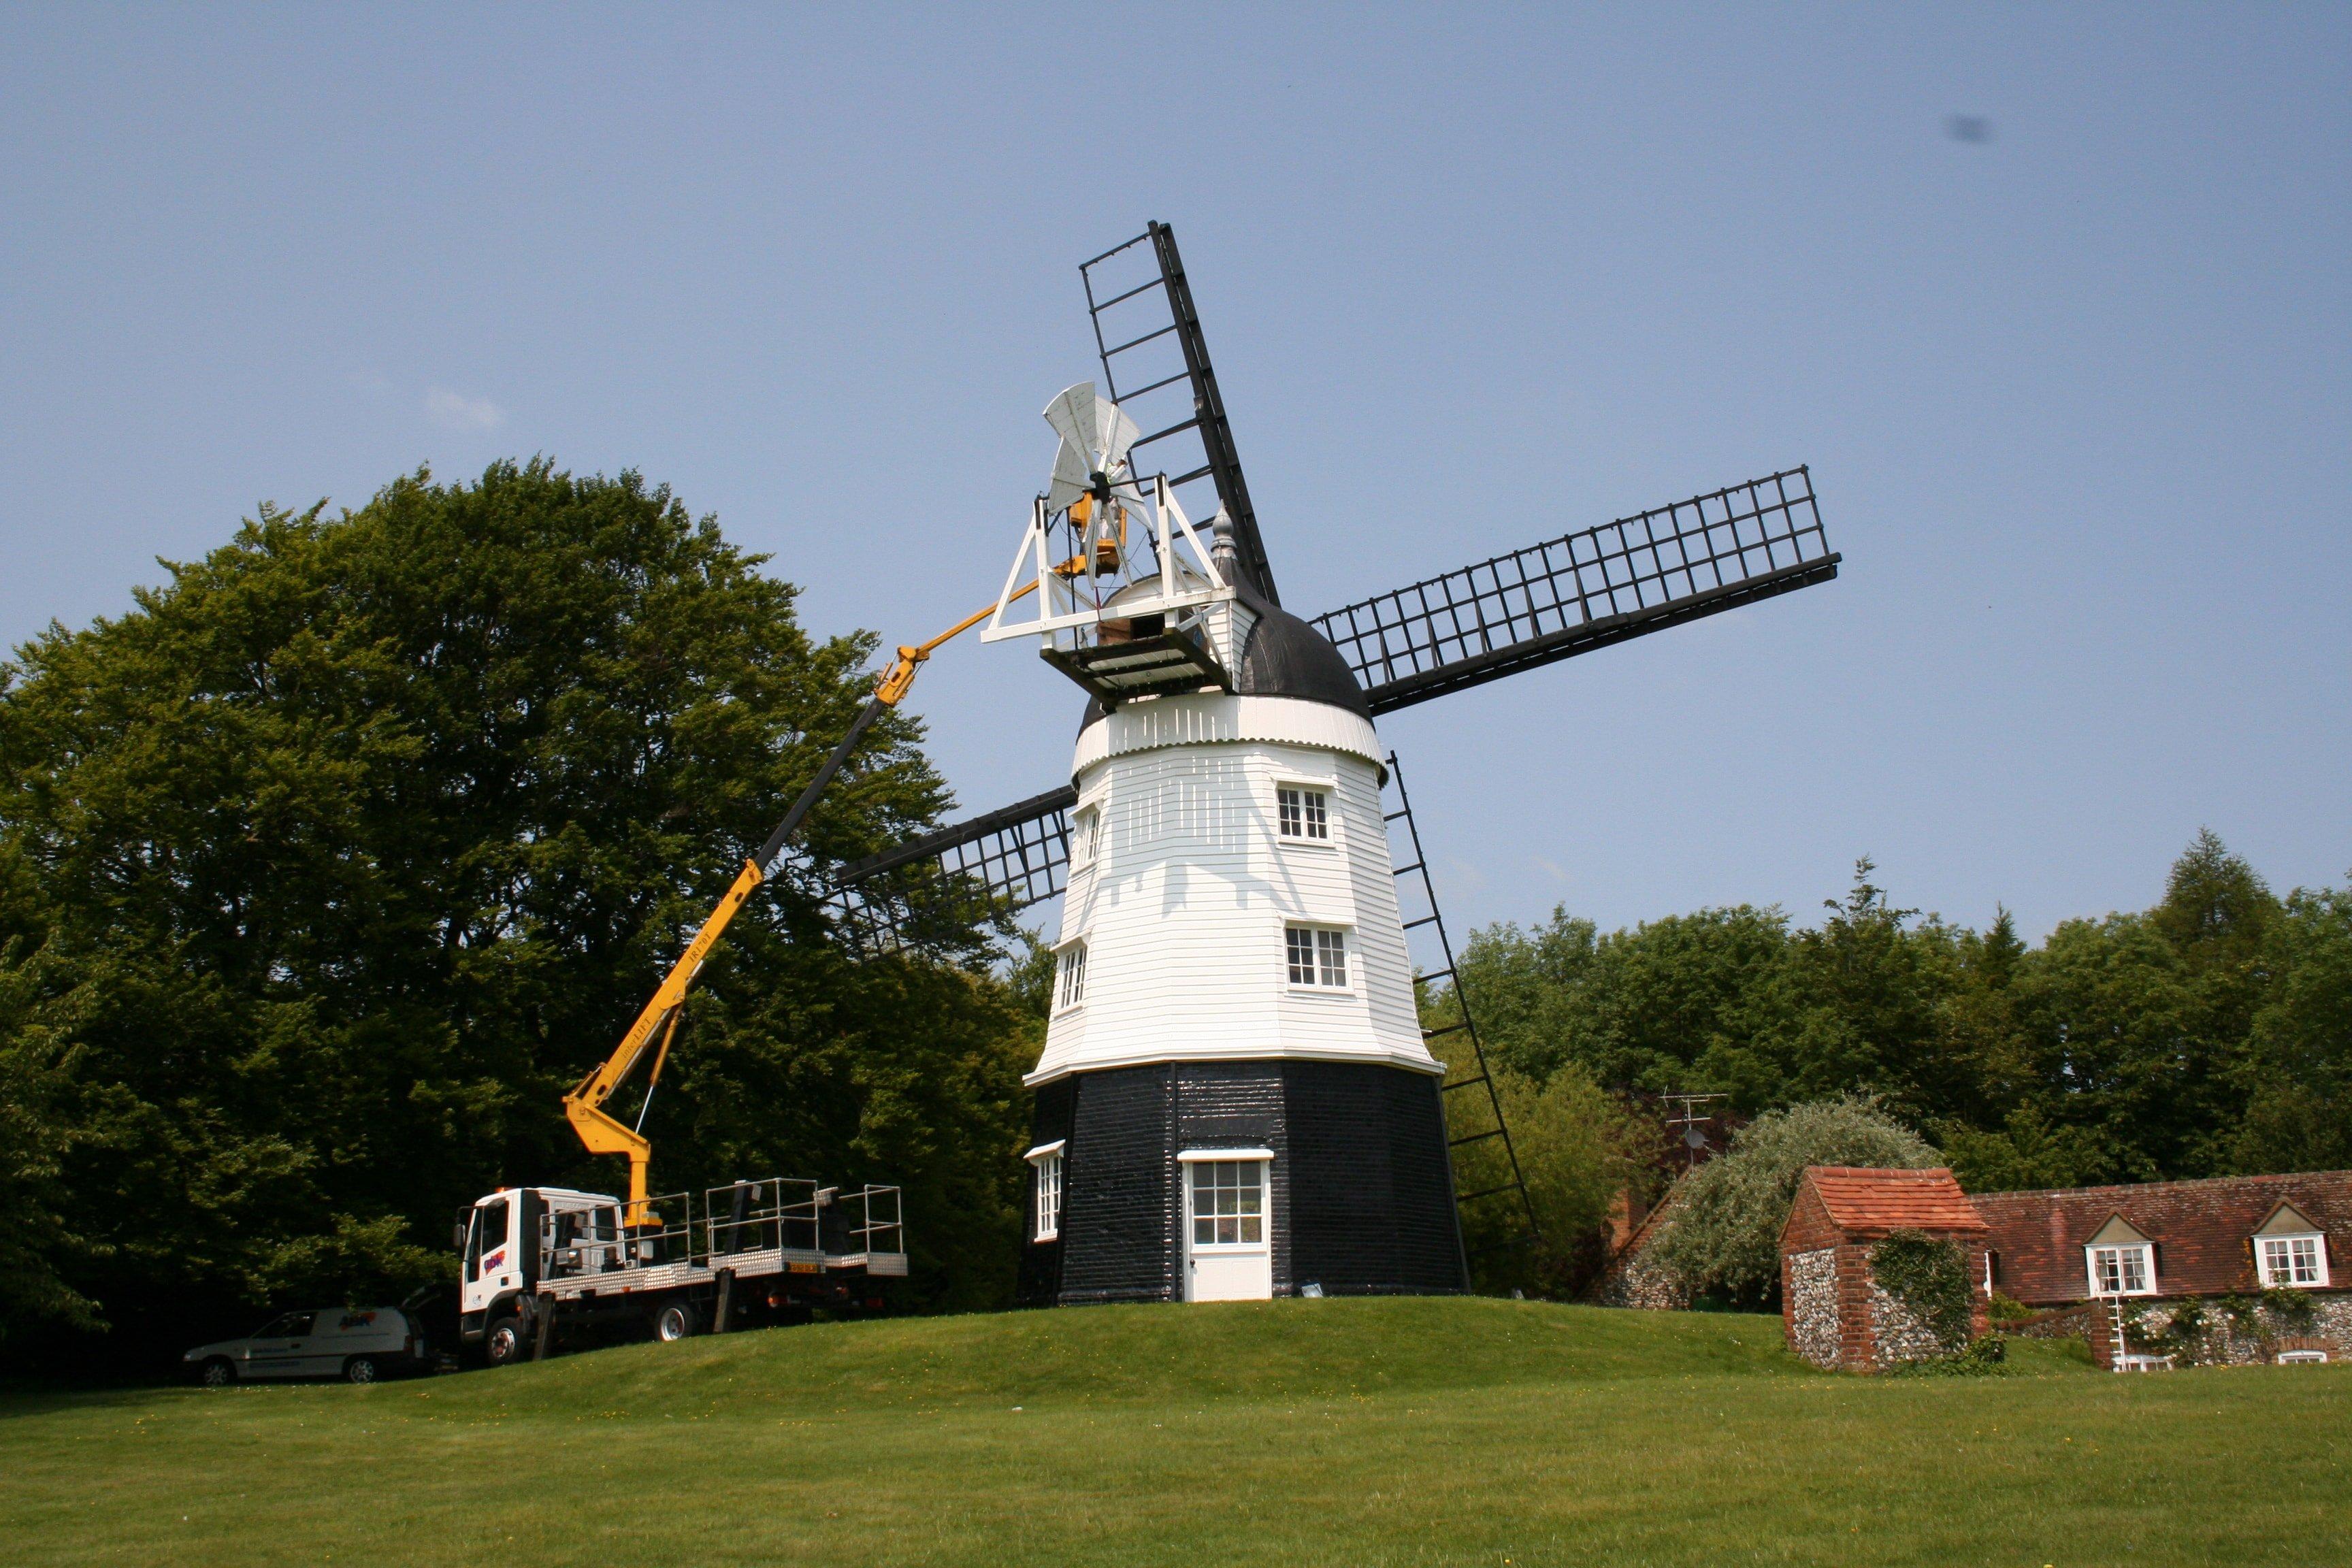 Cobstone Windmill Case Study